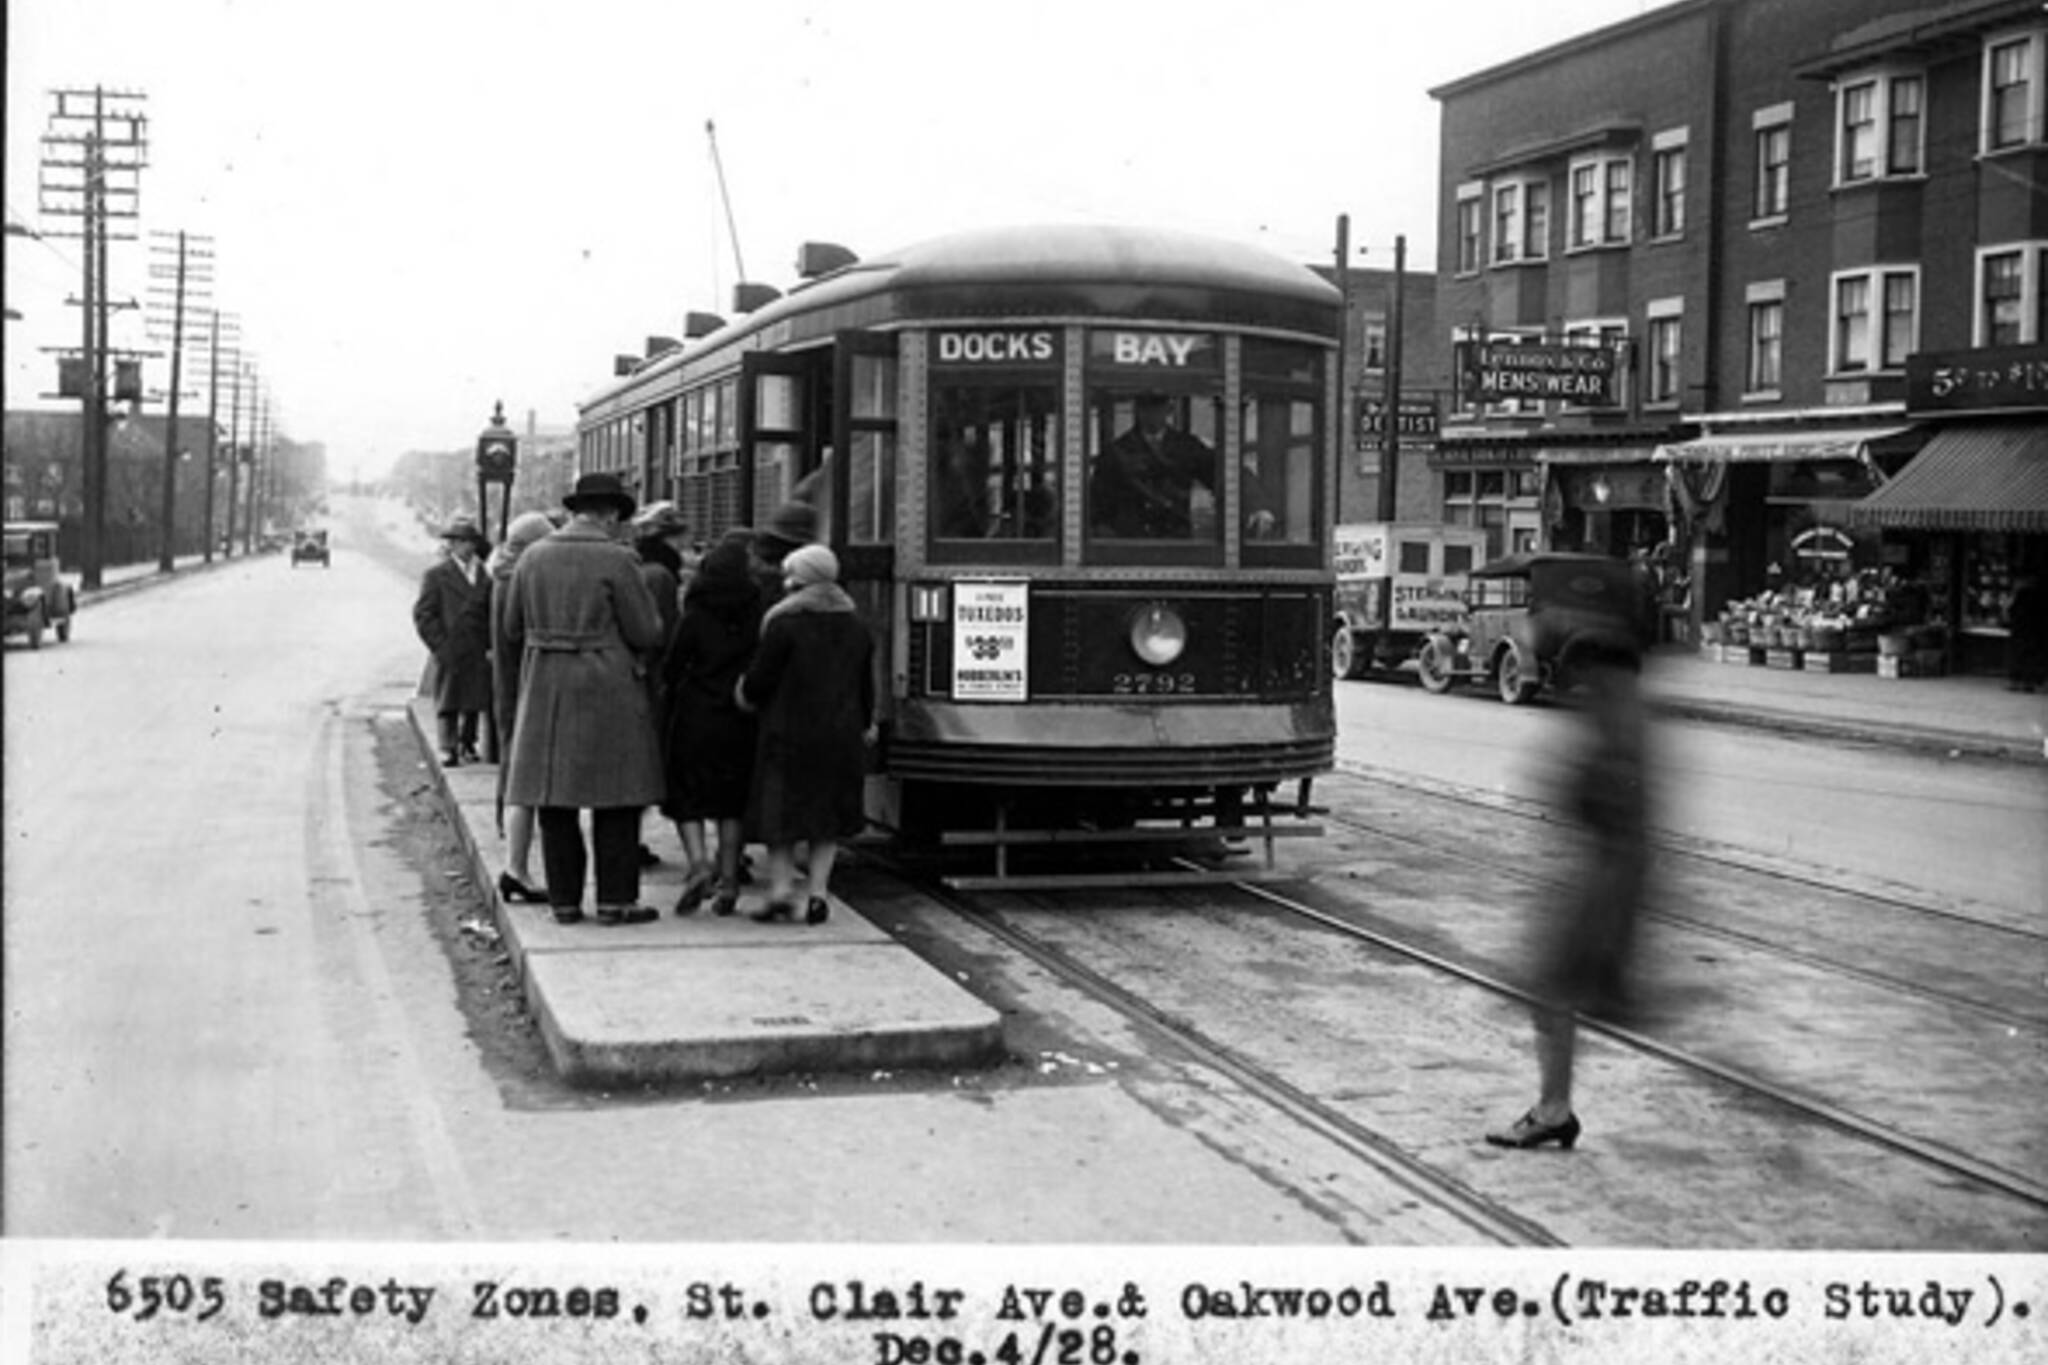 St. Clair Avenue History